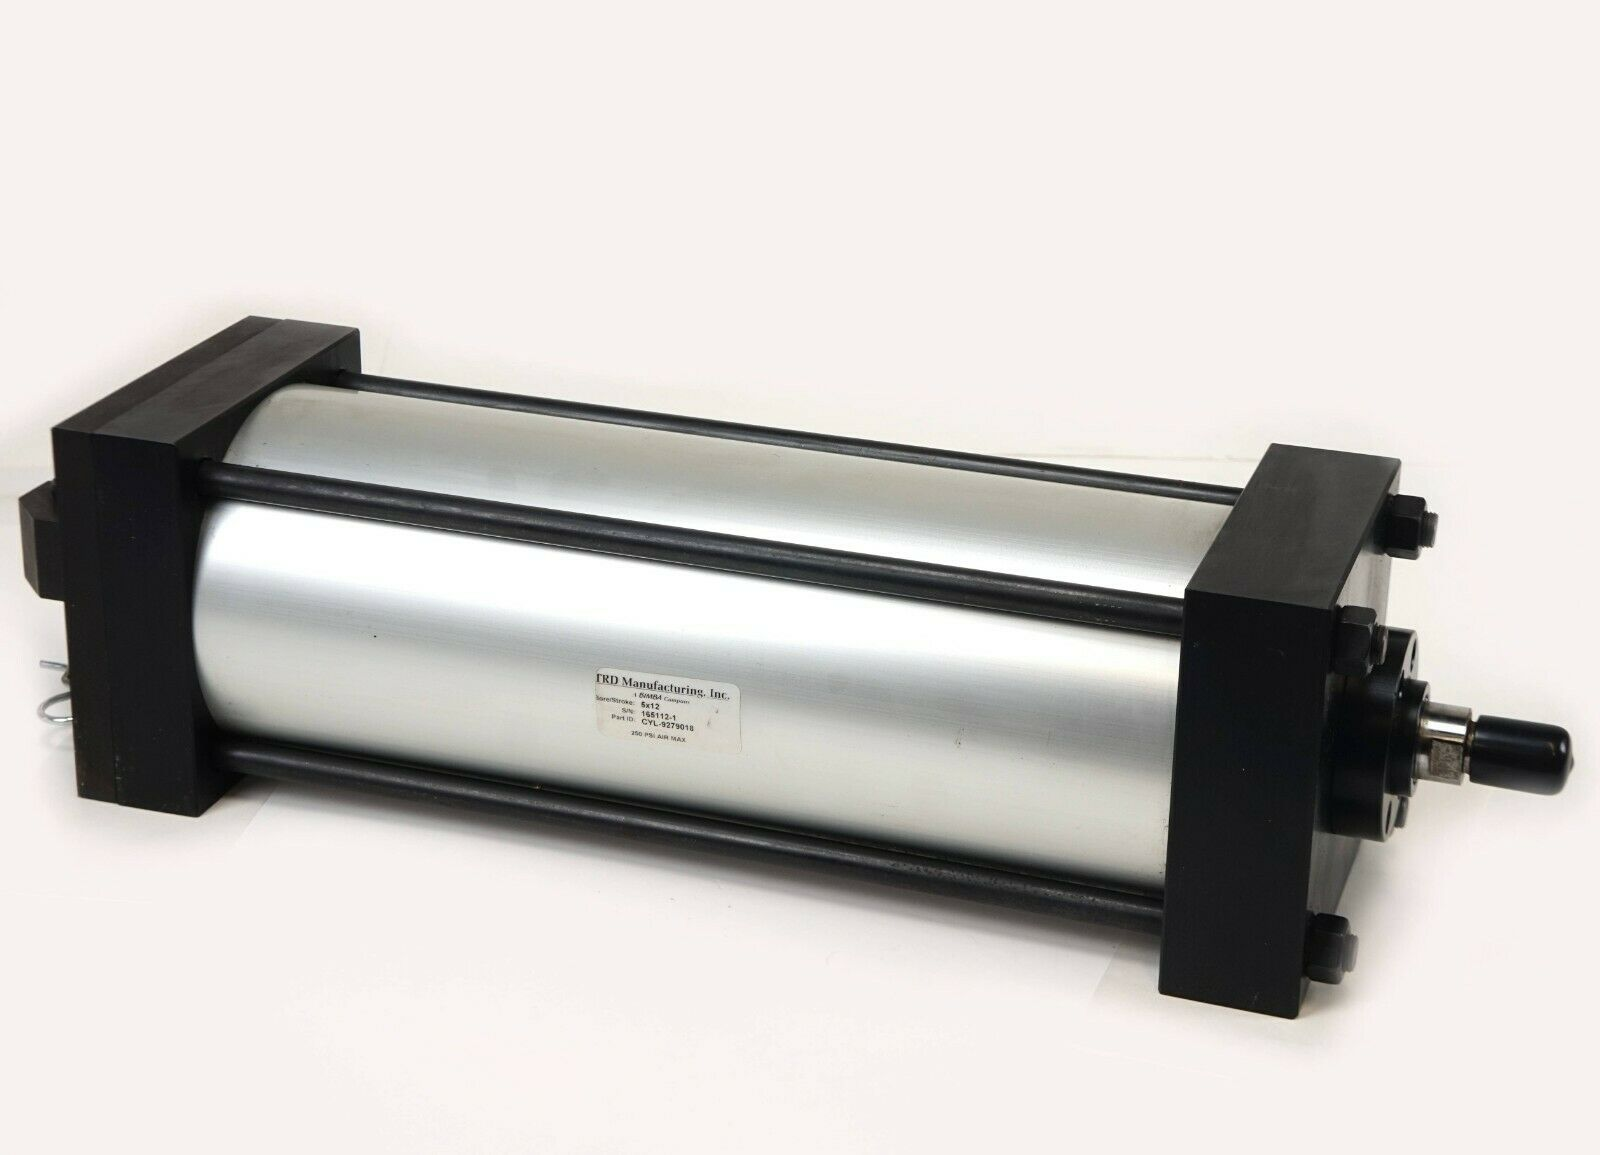 TRD Pneumatic cylinder